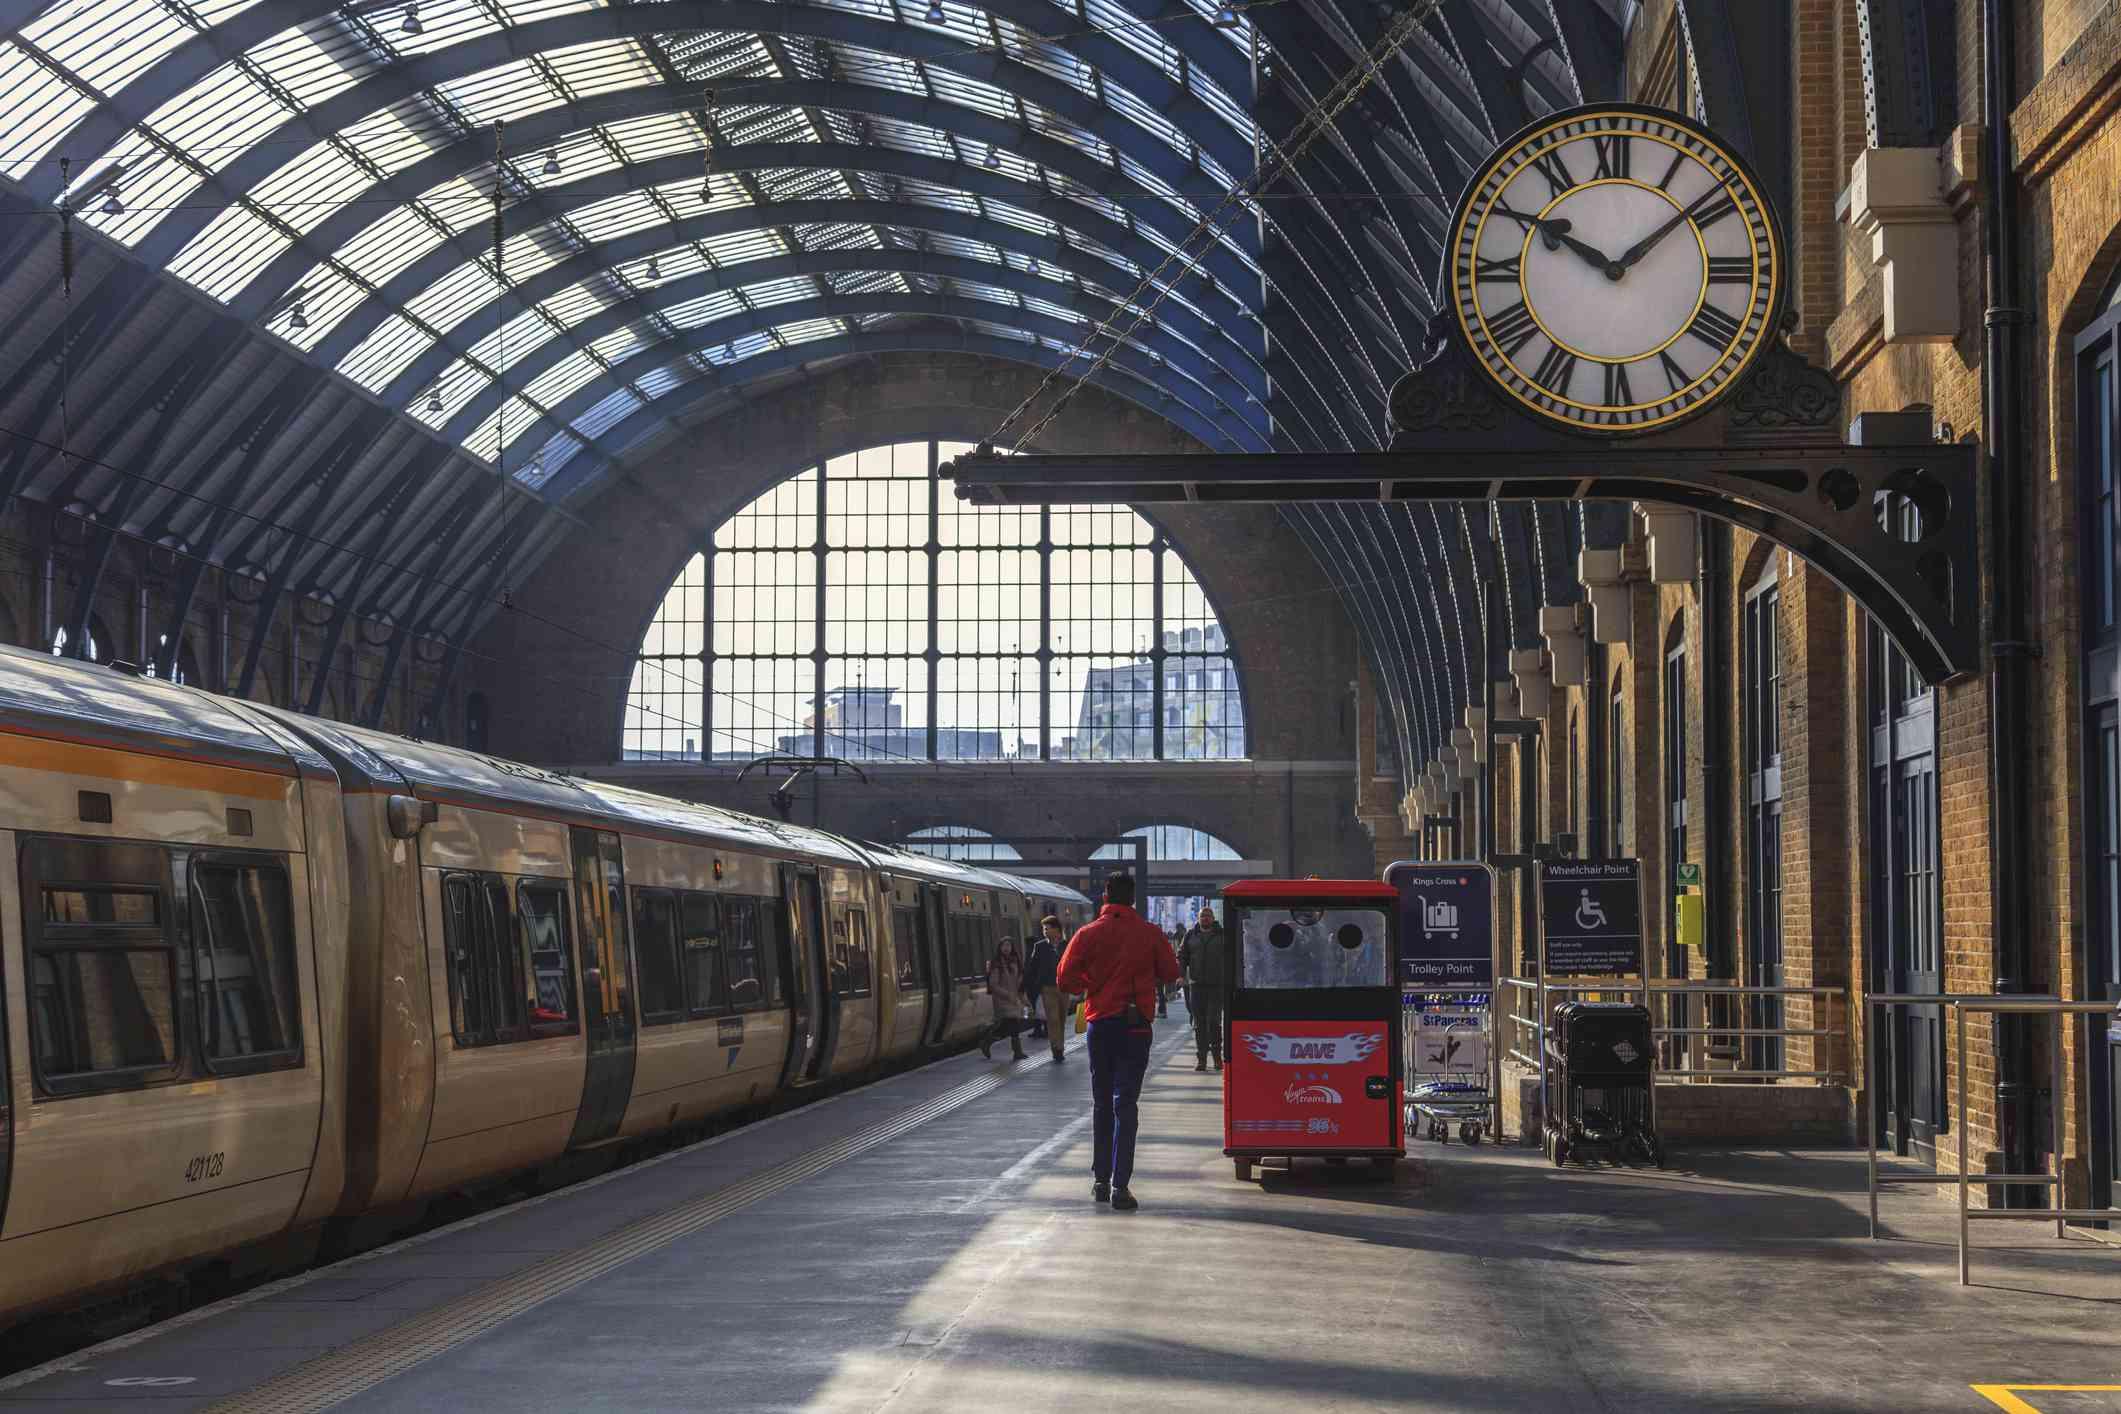 King's Cross Station, Platform 9 3/4 | Harry Potter